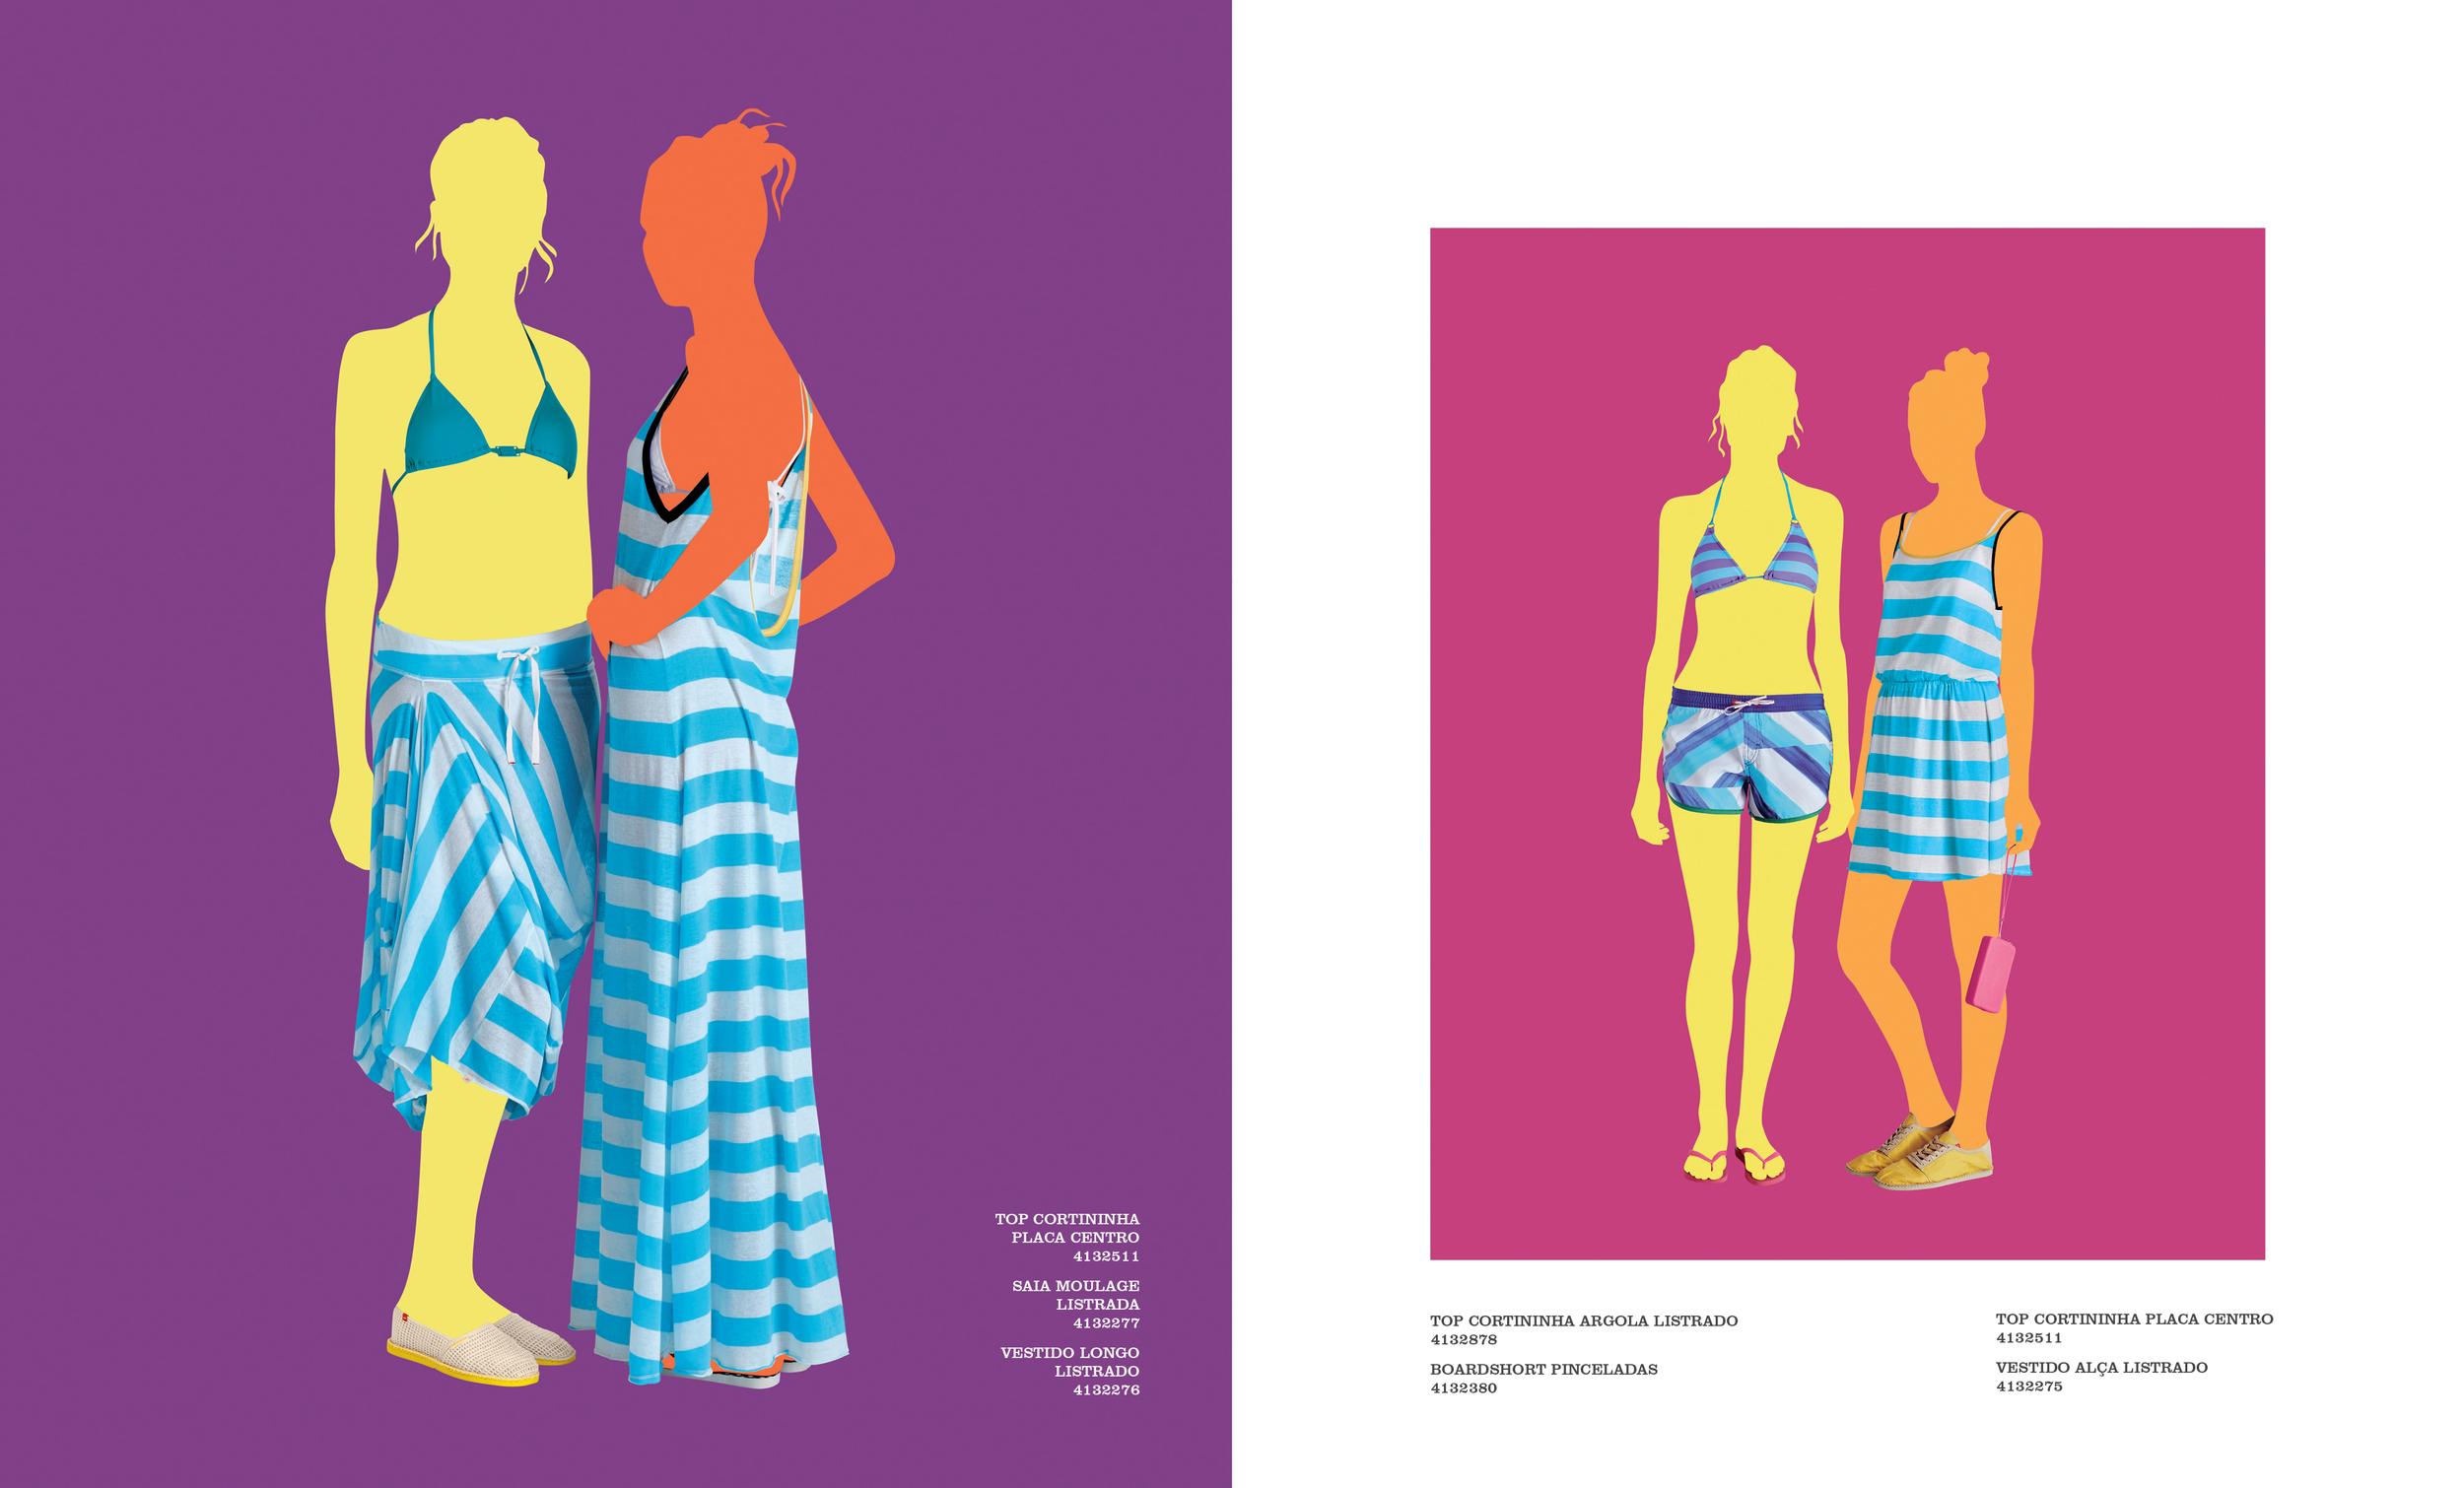 AFA_170x205mm_Look_Book_ilustrado_-30 copy.jpg